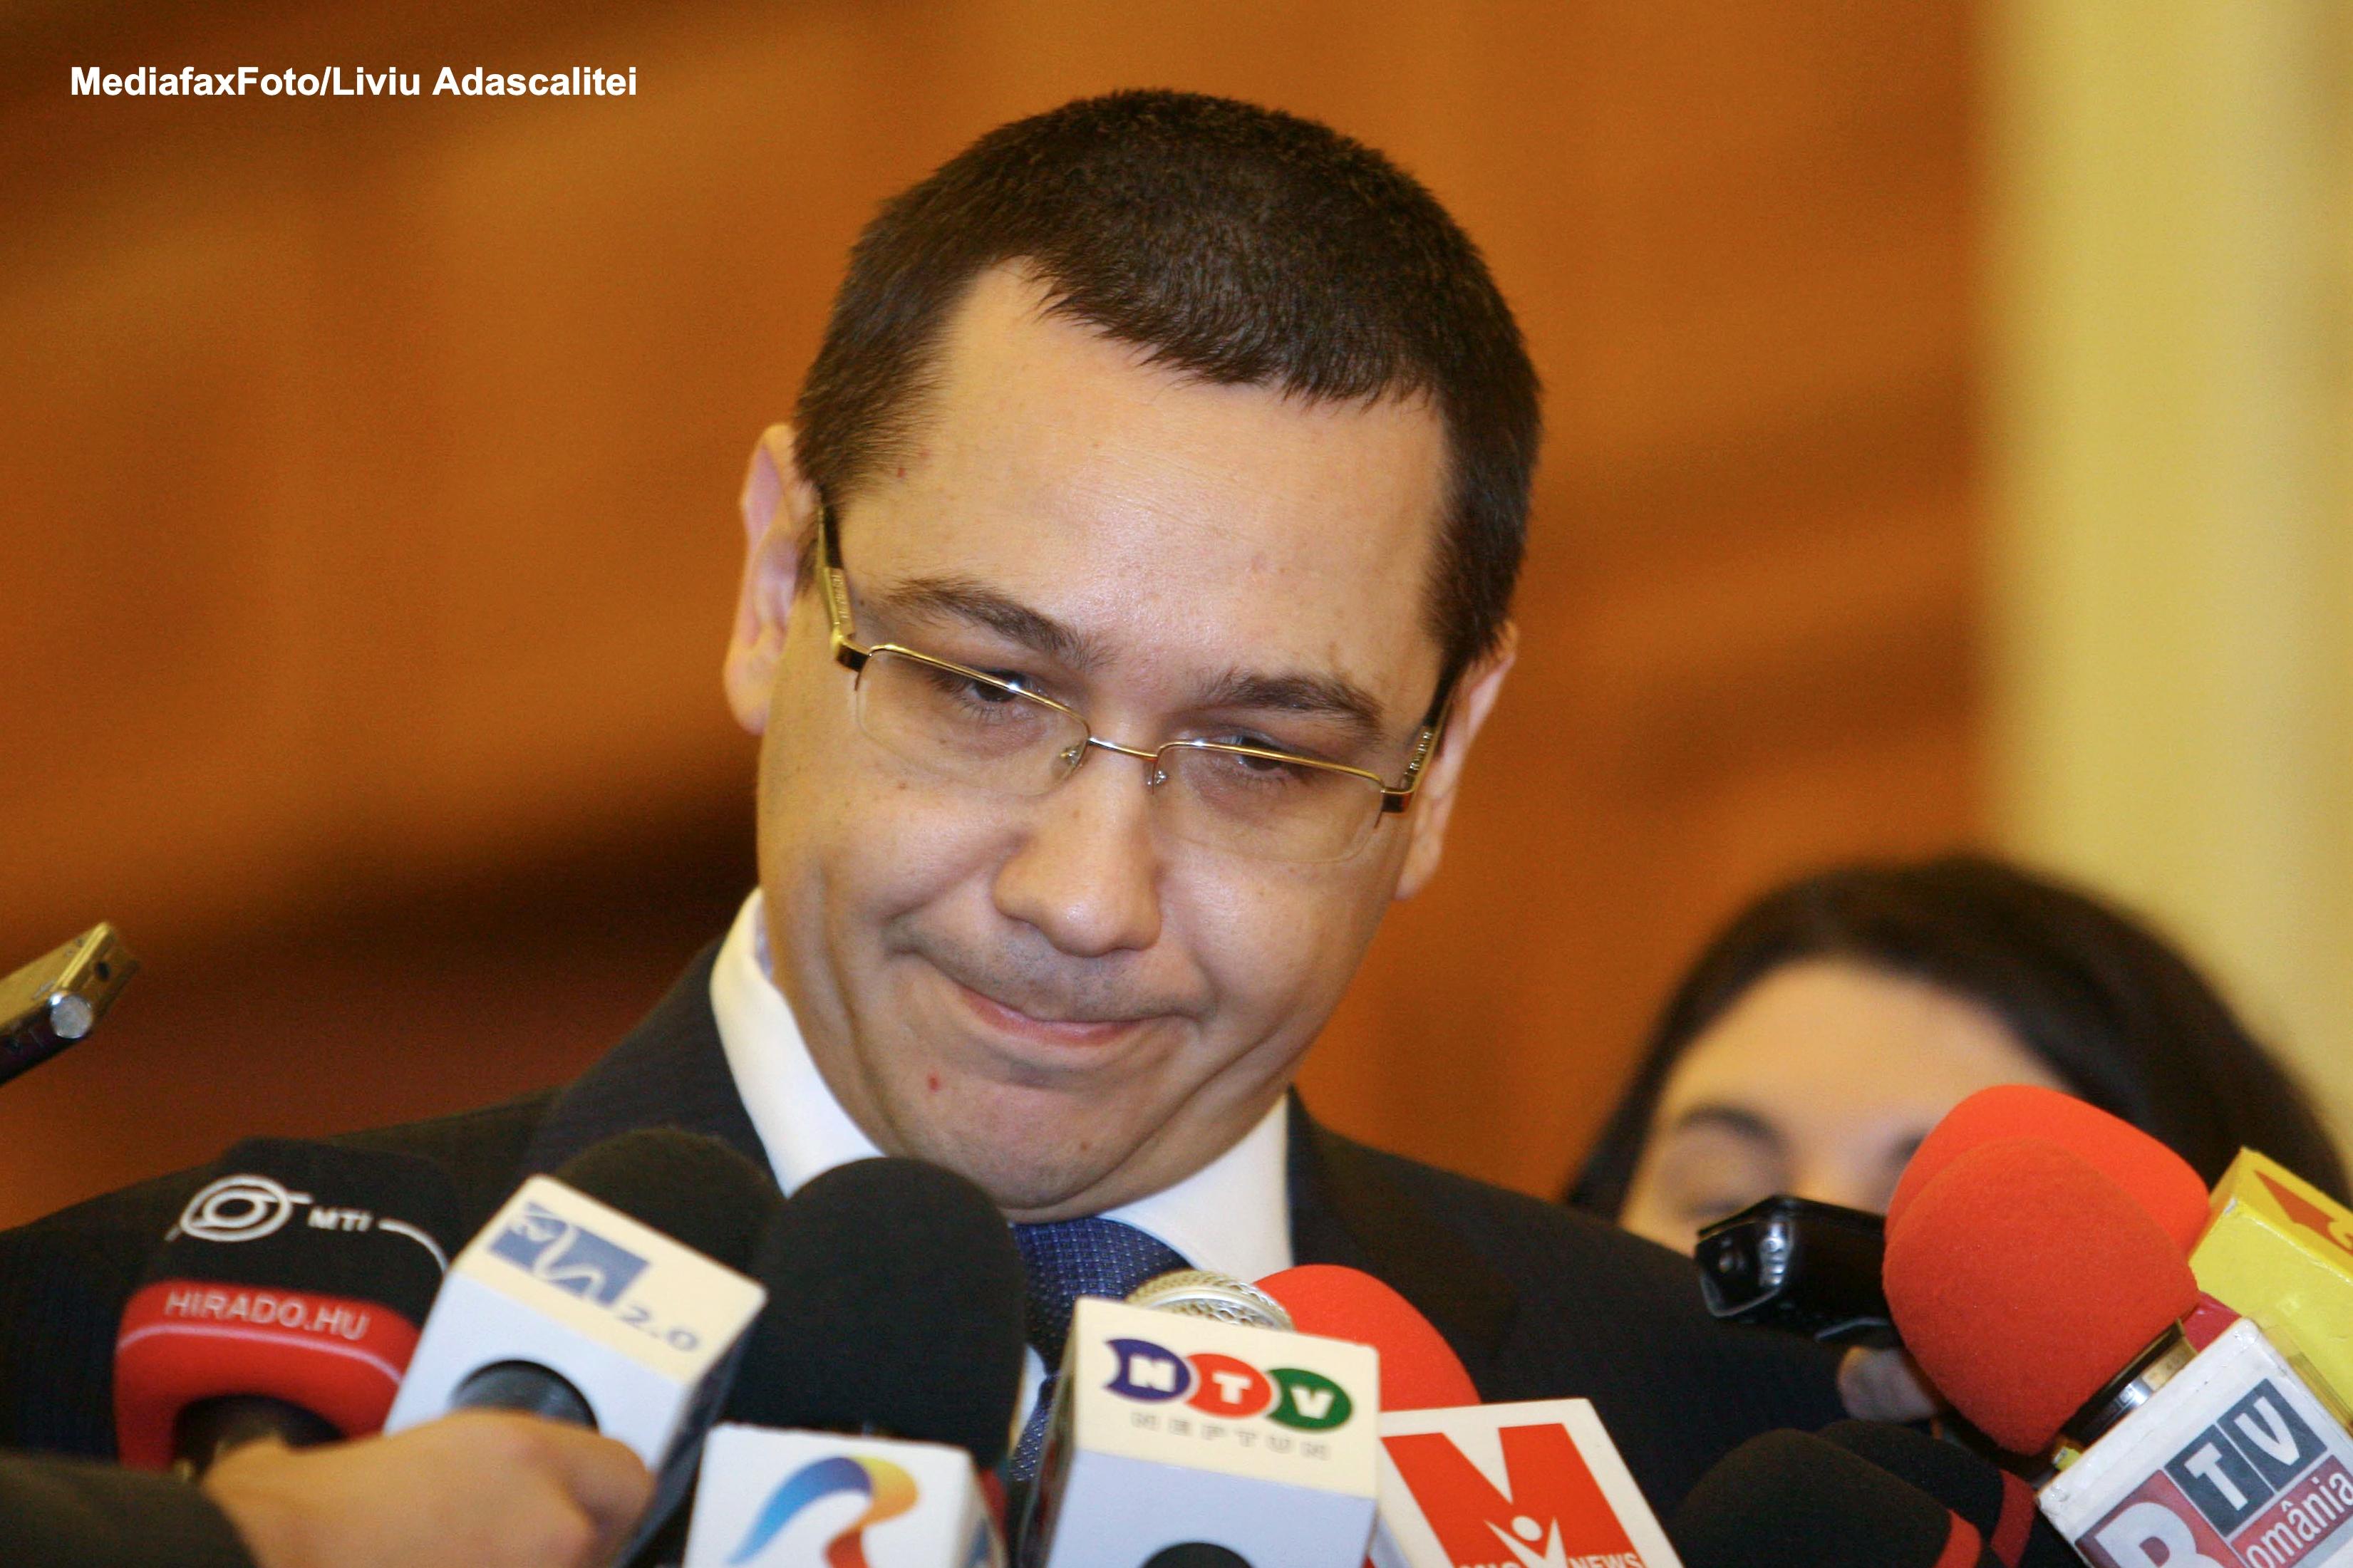 Premierul Victor Ponta anunta ca il va demite pe directorul ANSVSA, Mihai Turcanu